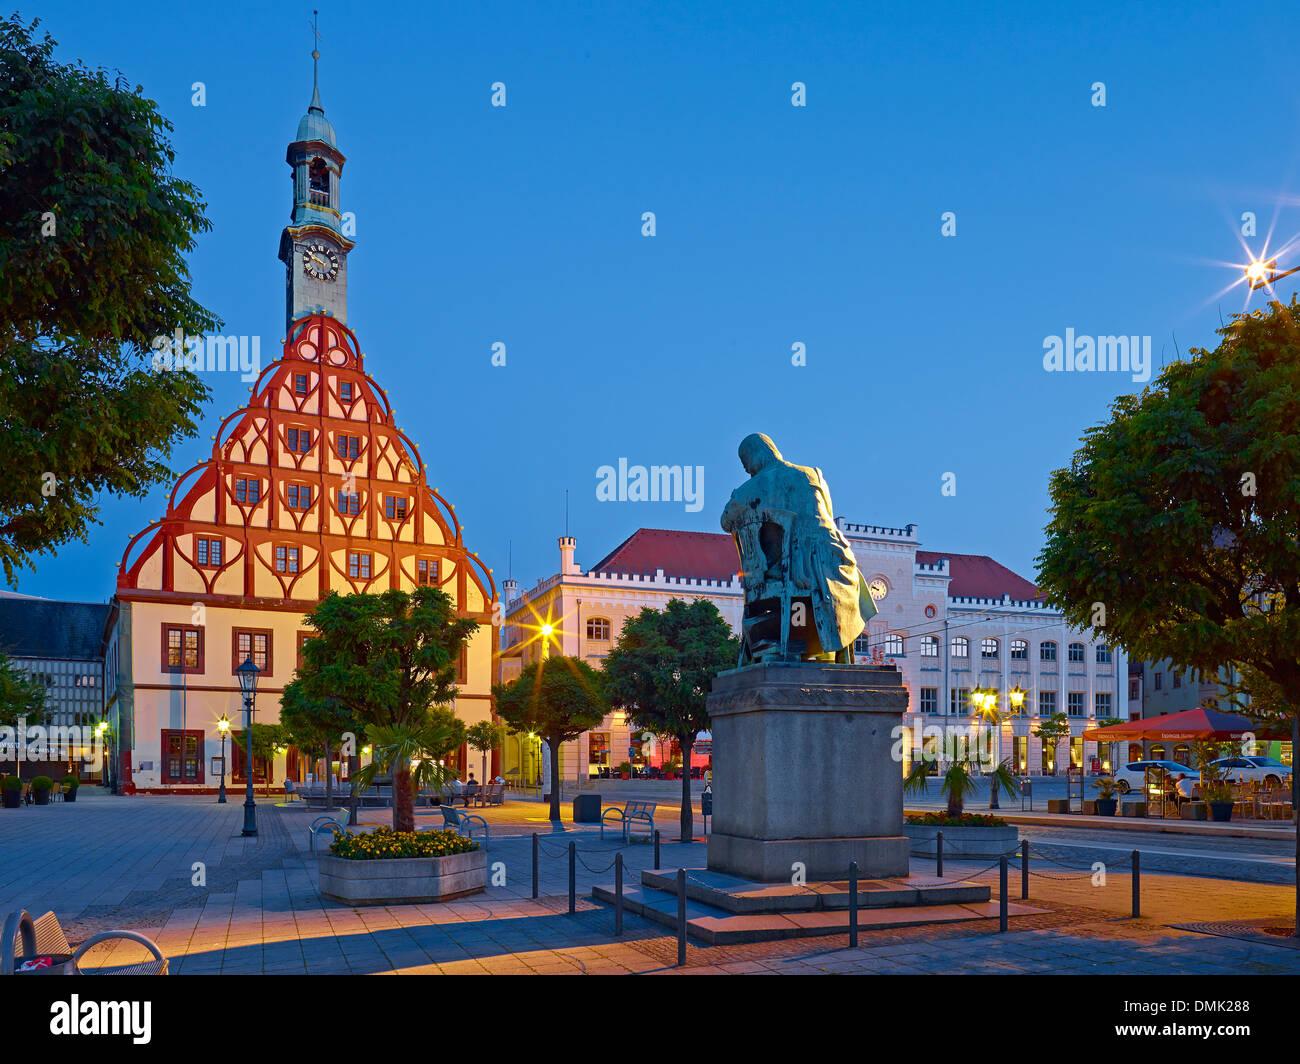 Gewandhaus, Schumann Monument and City Hall in Zwickau, Saxony, Germany - Stock Image